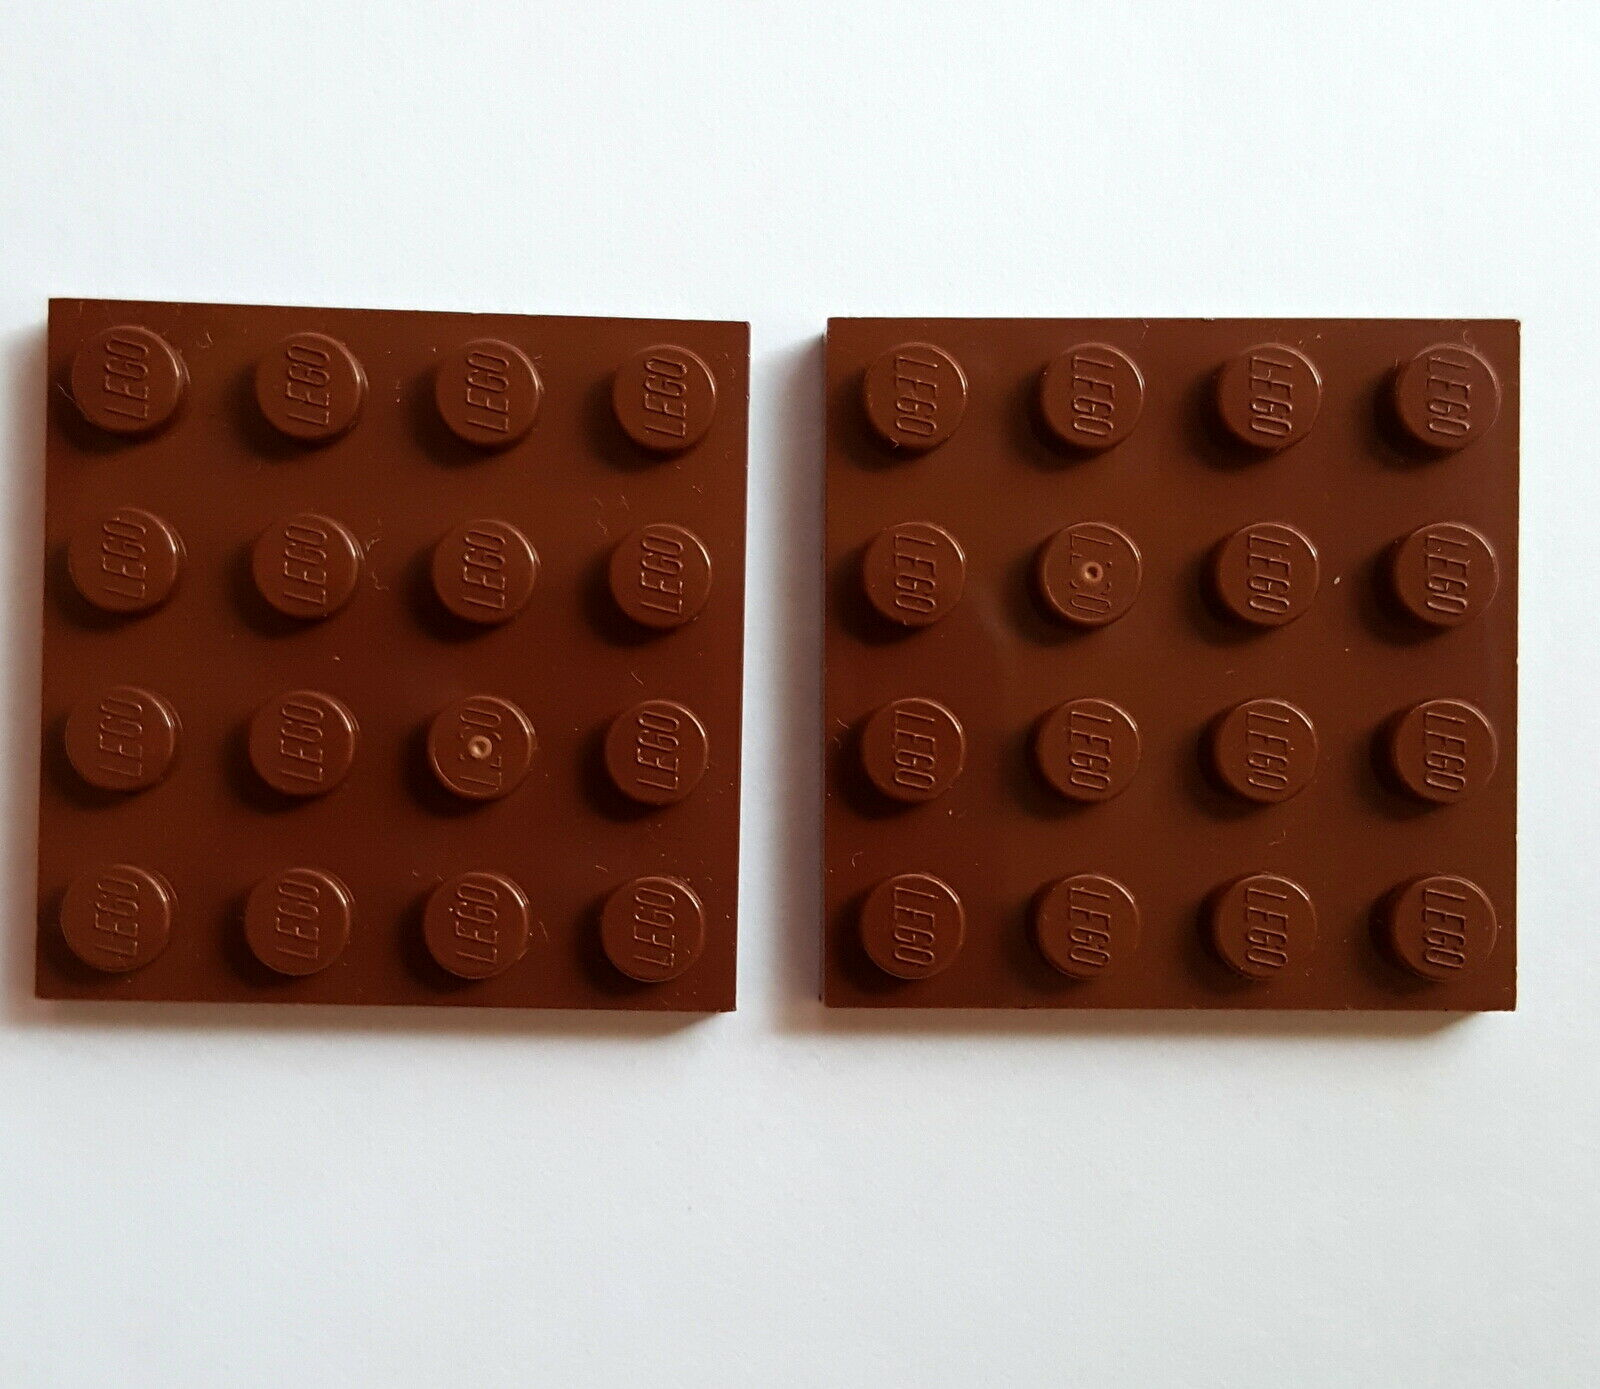 LEGO 4 x Keilstein Flügel 43710 43711 neu dunkelgrau  = 2 Paar  4x2